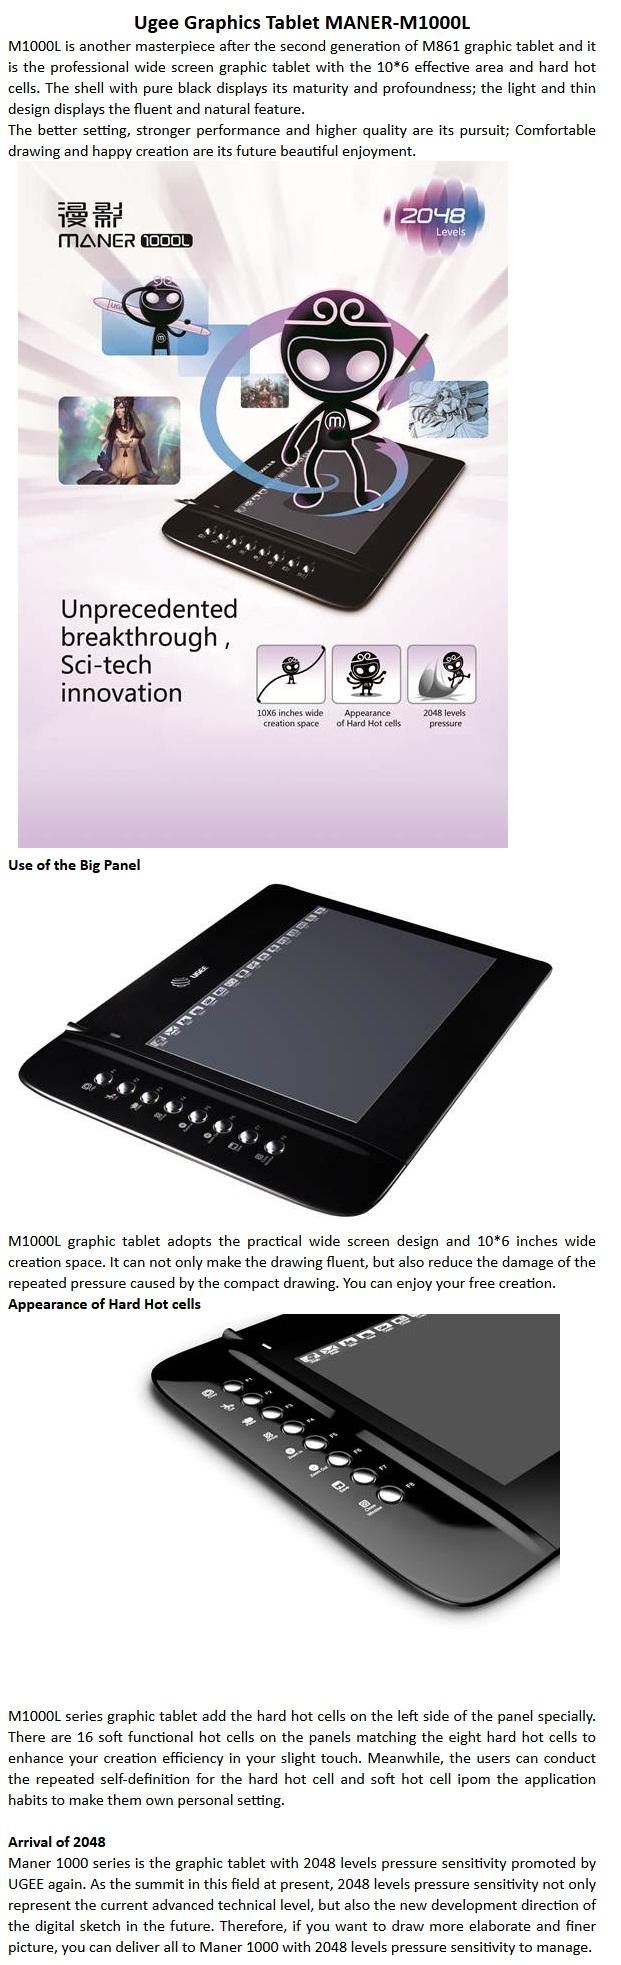 ugee m1000l 10 x6 2 tablette graphique art conception ultra mince cran large ebay. Black Bedroom Furniture Sets. Home Design Ideas